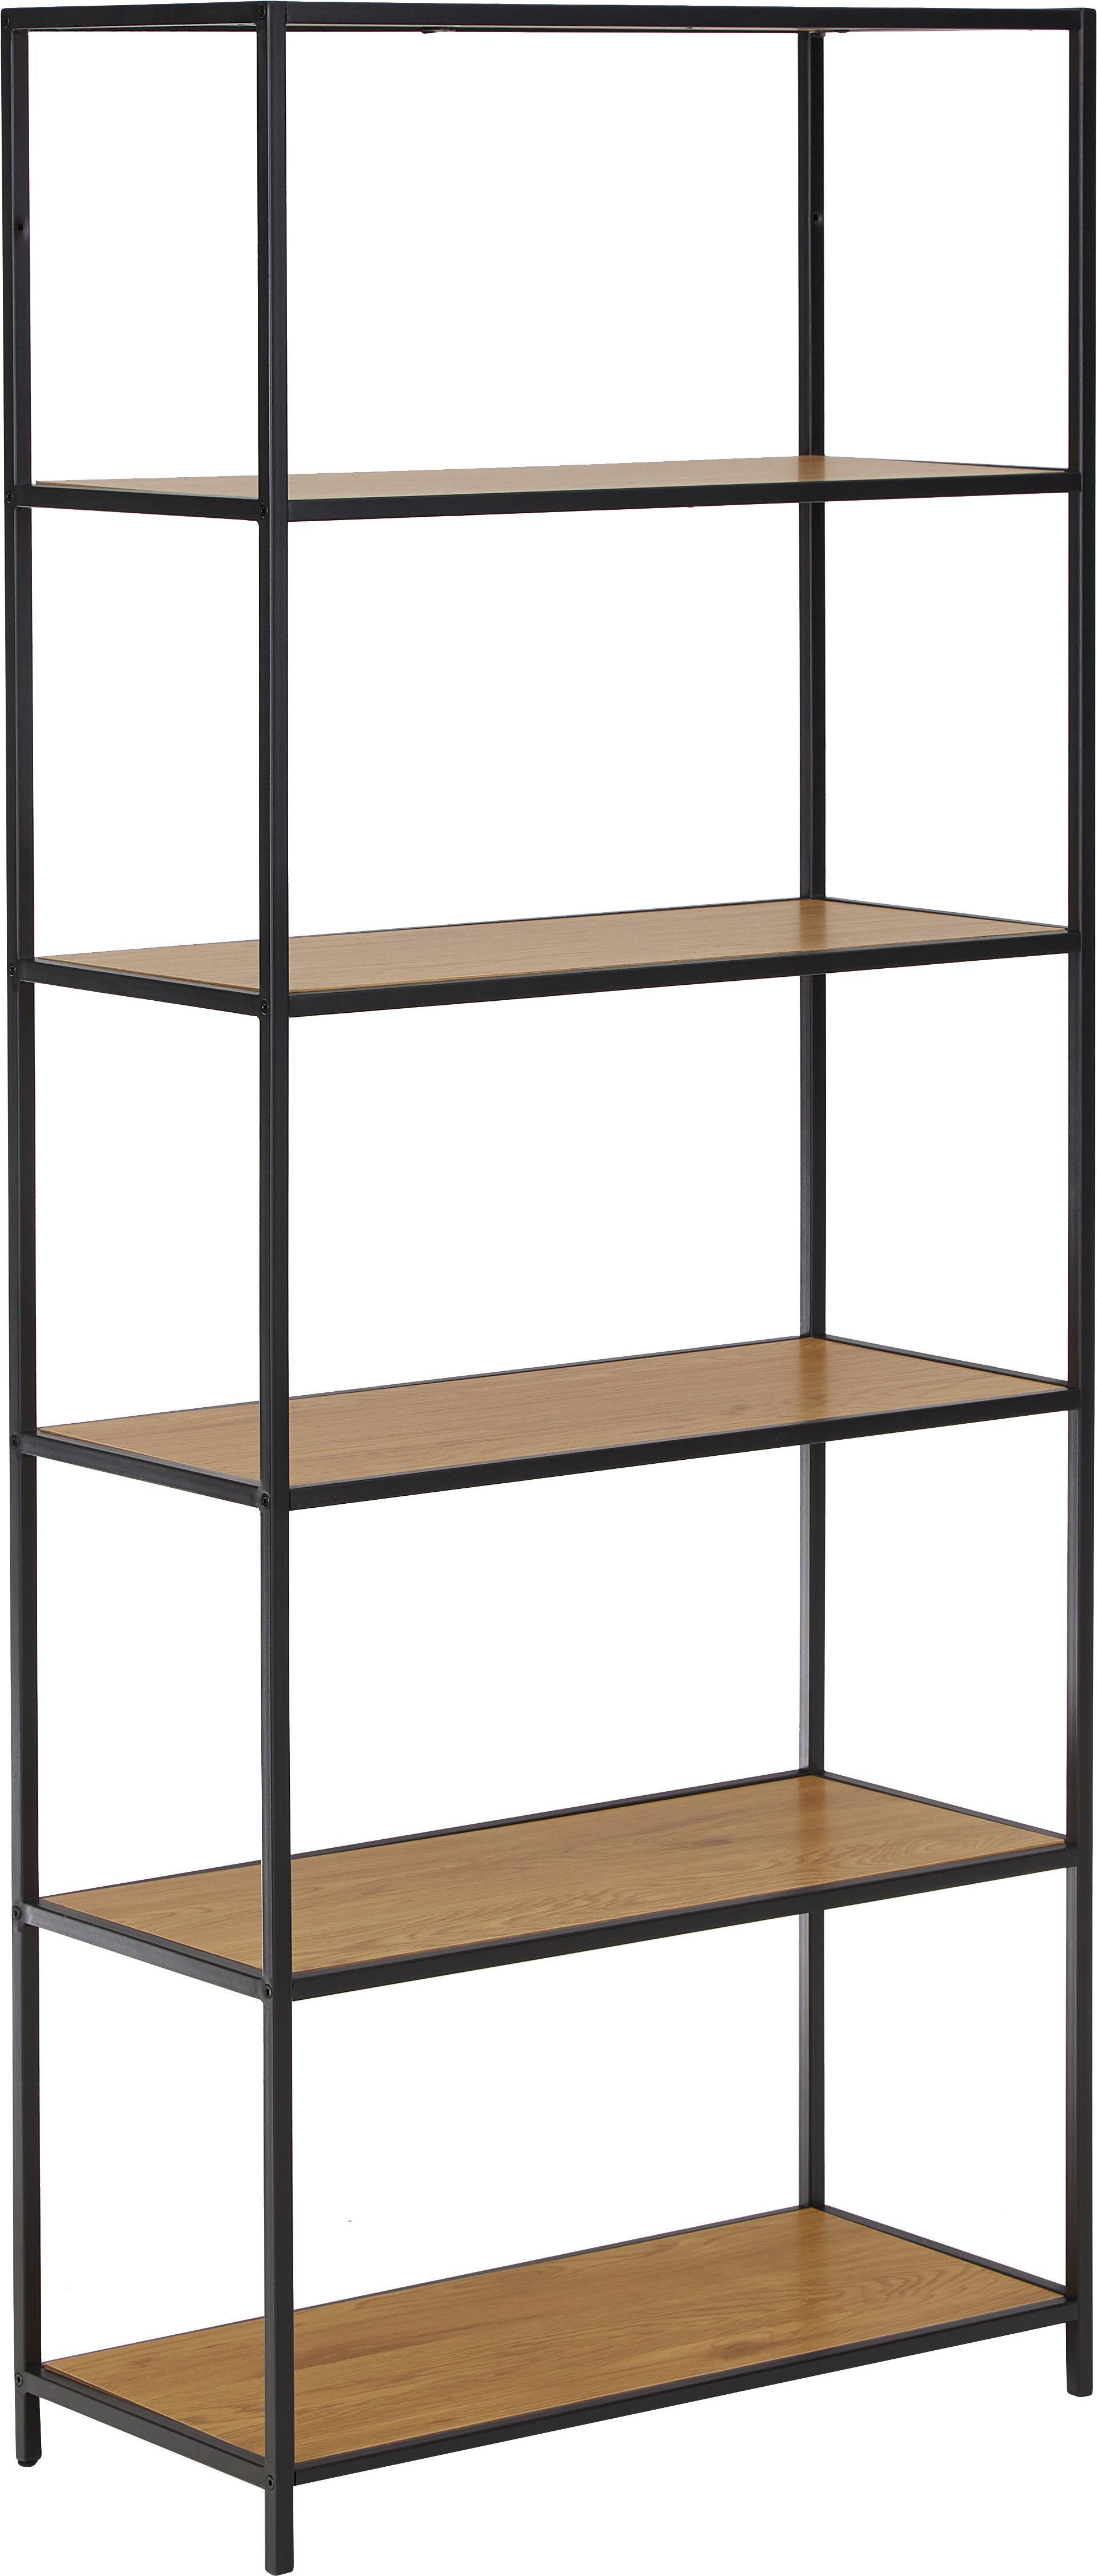 Estantería alta Seaford, Estantes: tablero de fibras de dens, Estructura: metal con pintura en polv, Roble, negro, An 77 x Al 185 cm